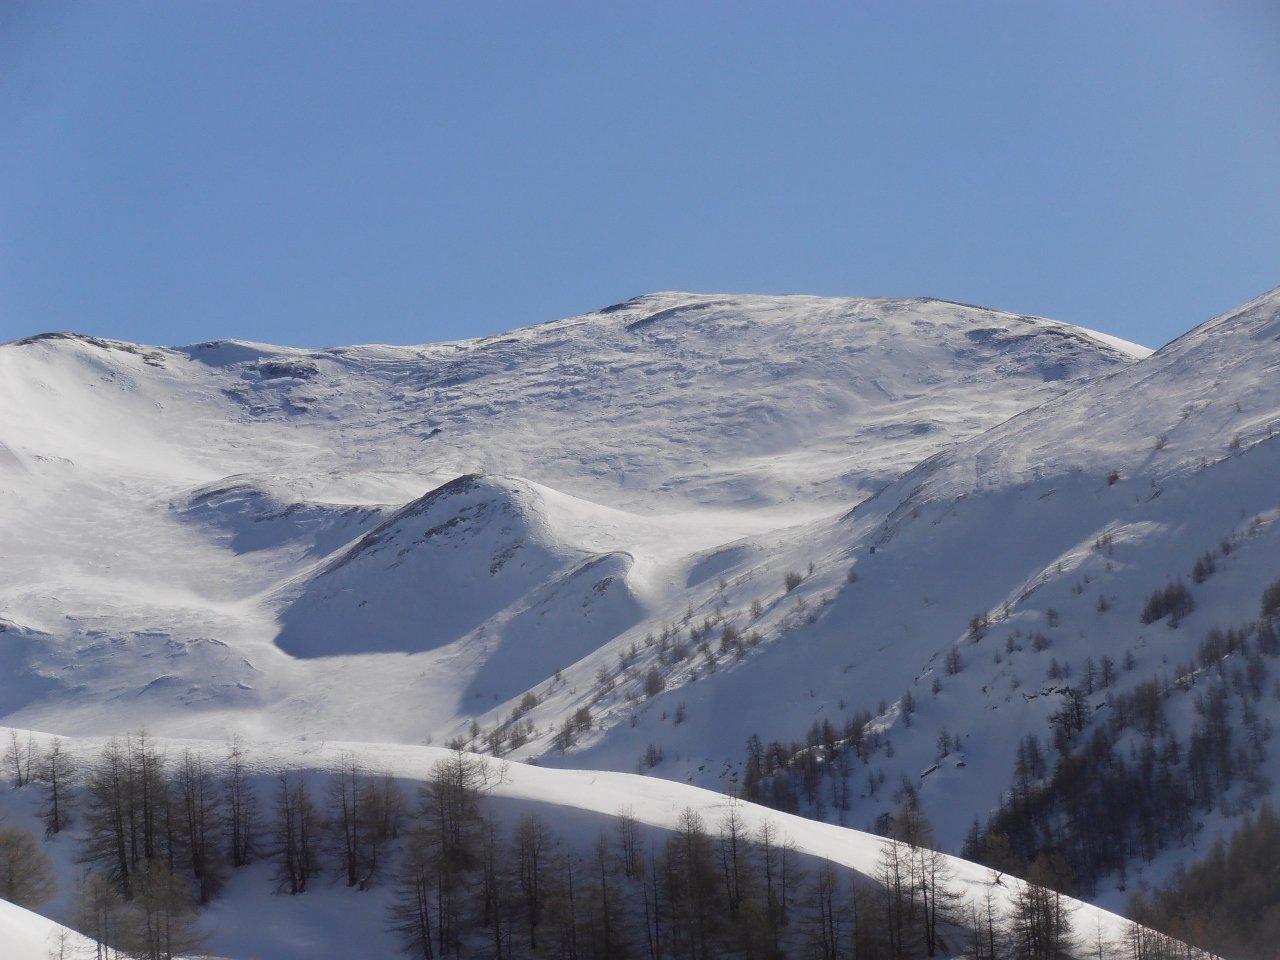 04 - Monte Vin Vert, parte alta rovinata dal vento